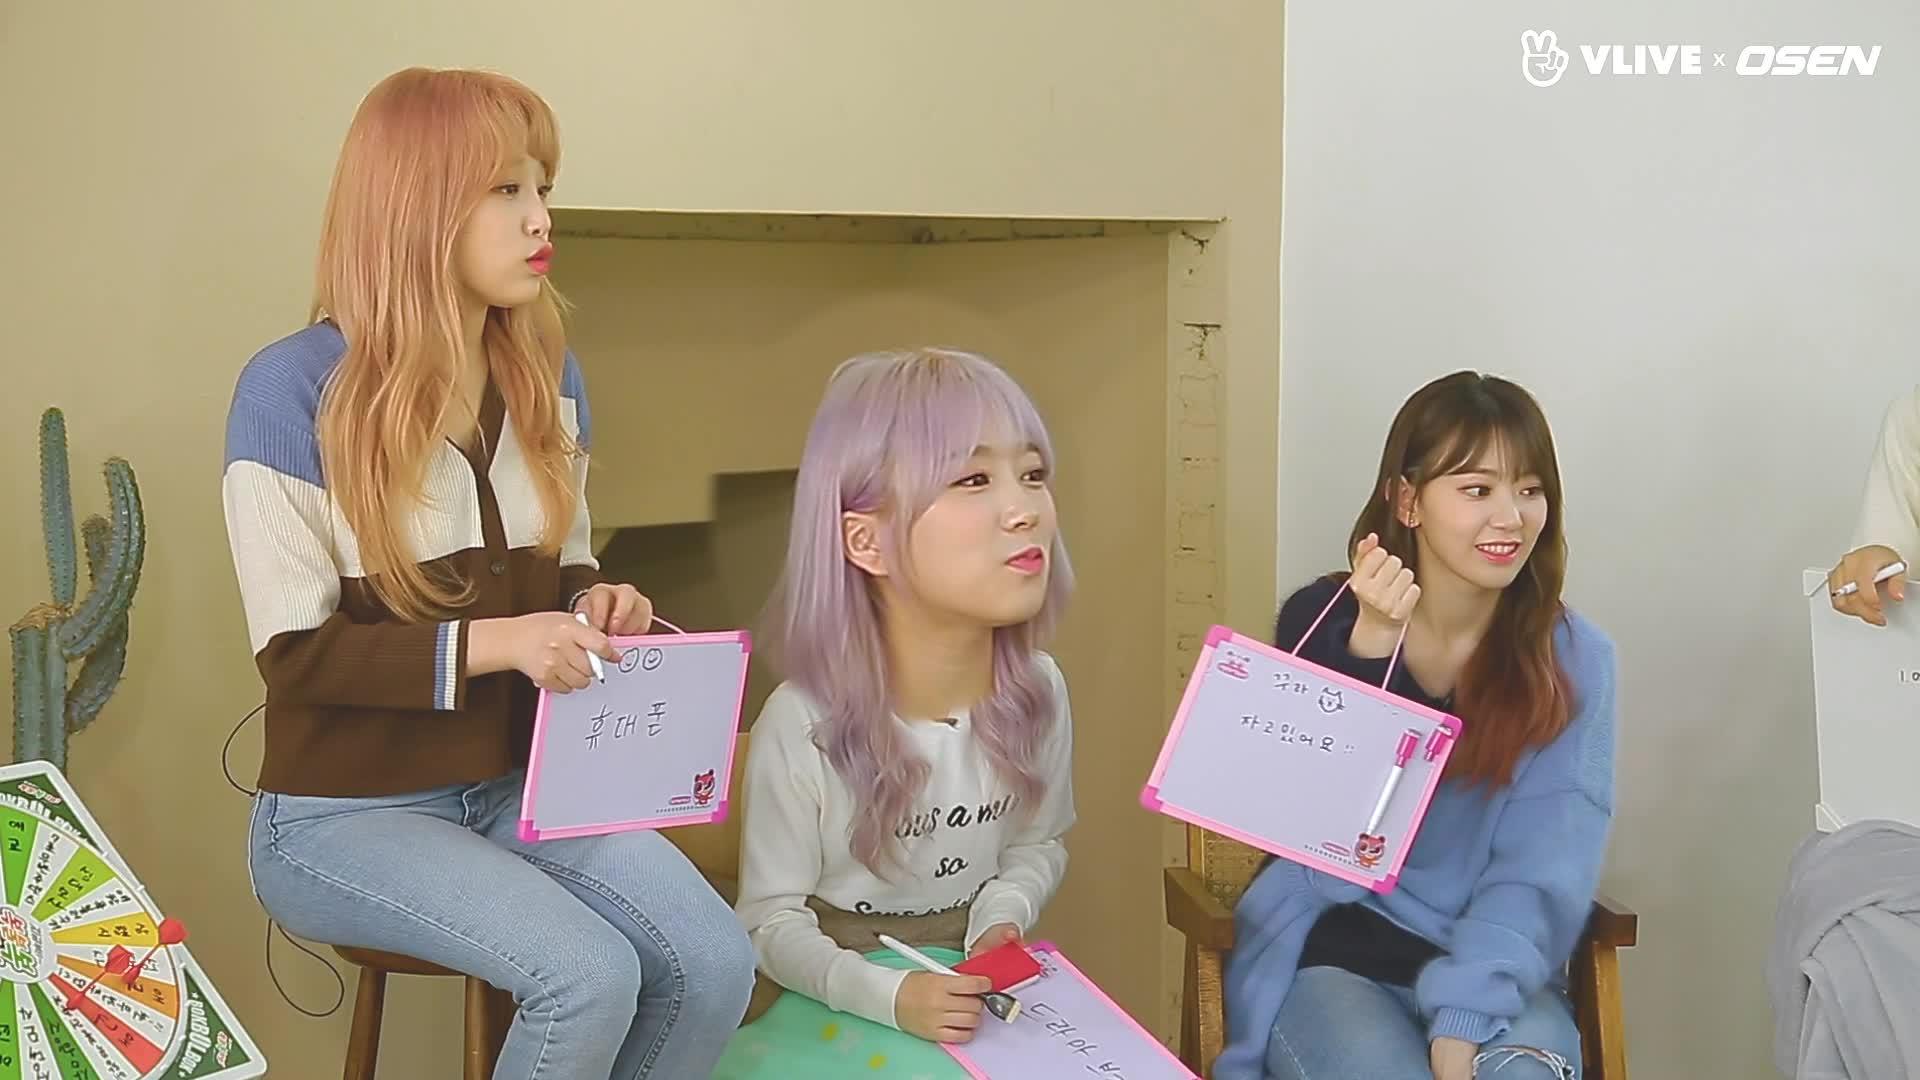 IZ*ONE 아이즈원 멤버들이 꼽은 최고 집순이는 #스타로드 09